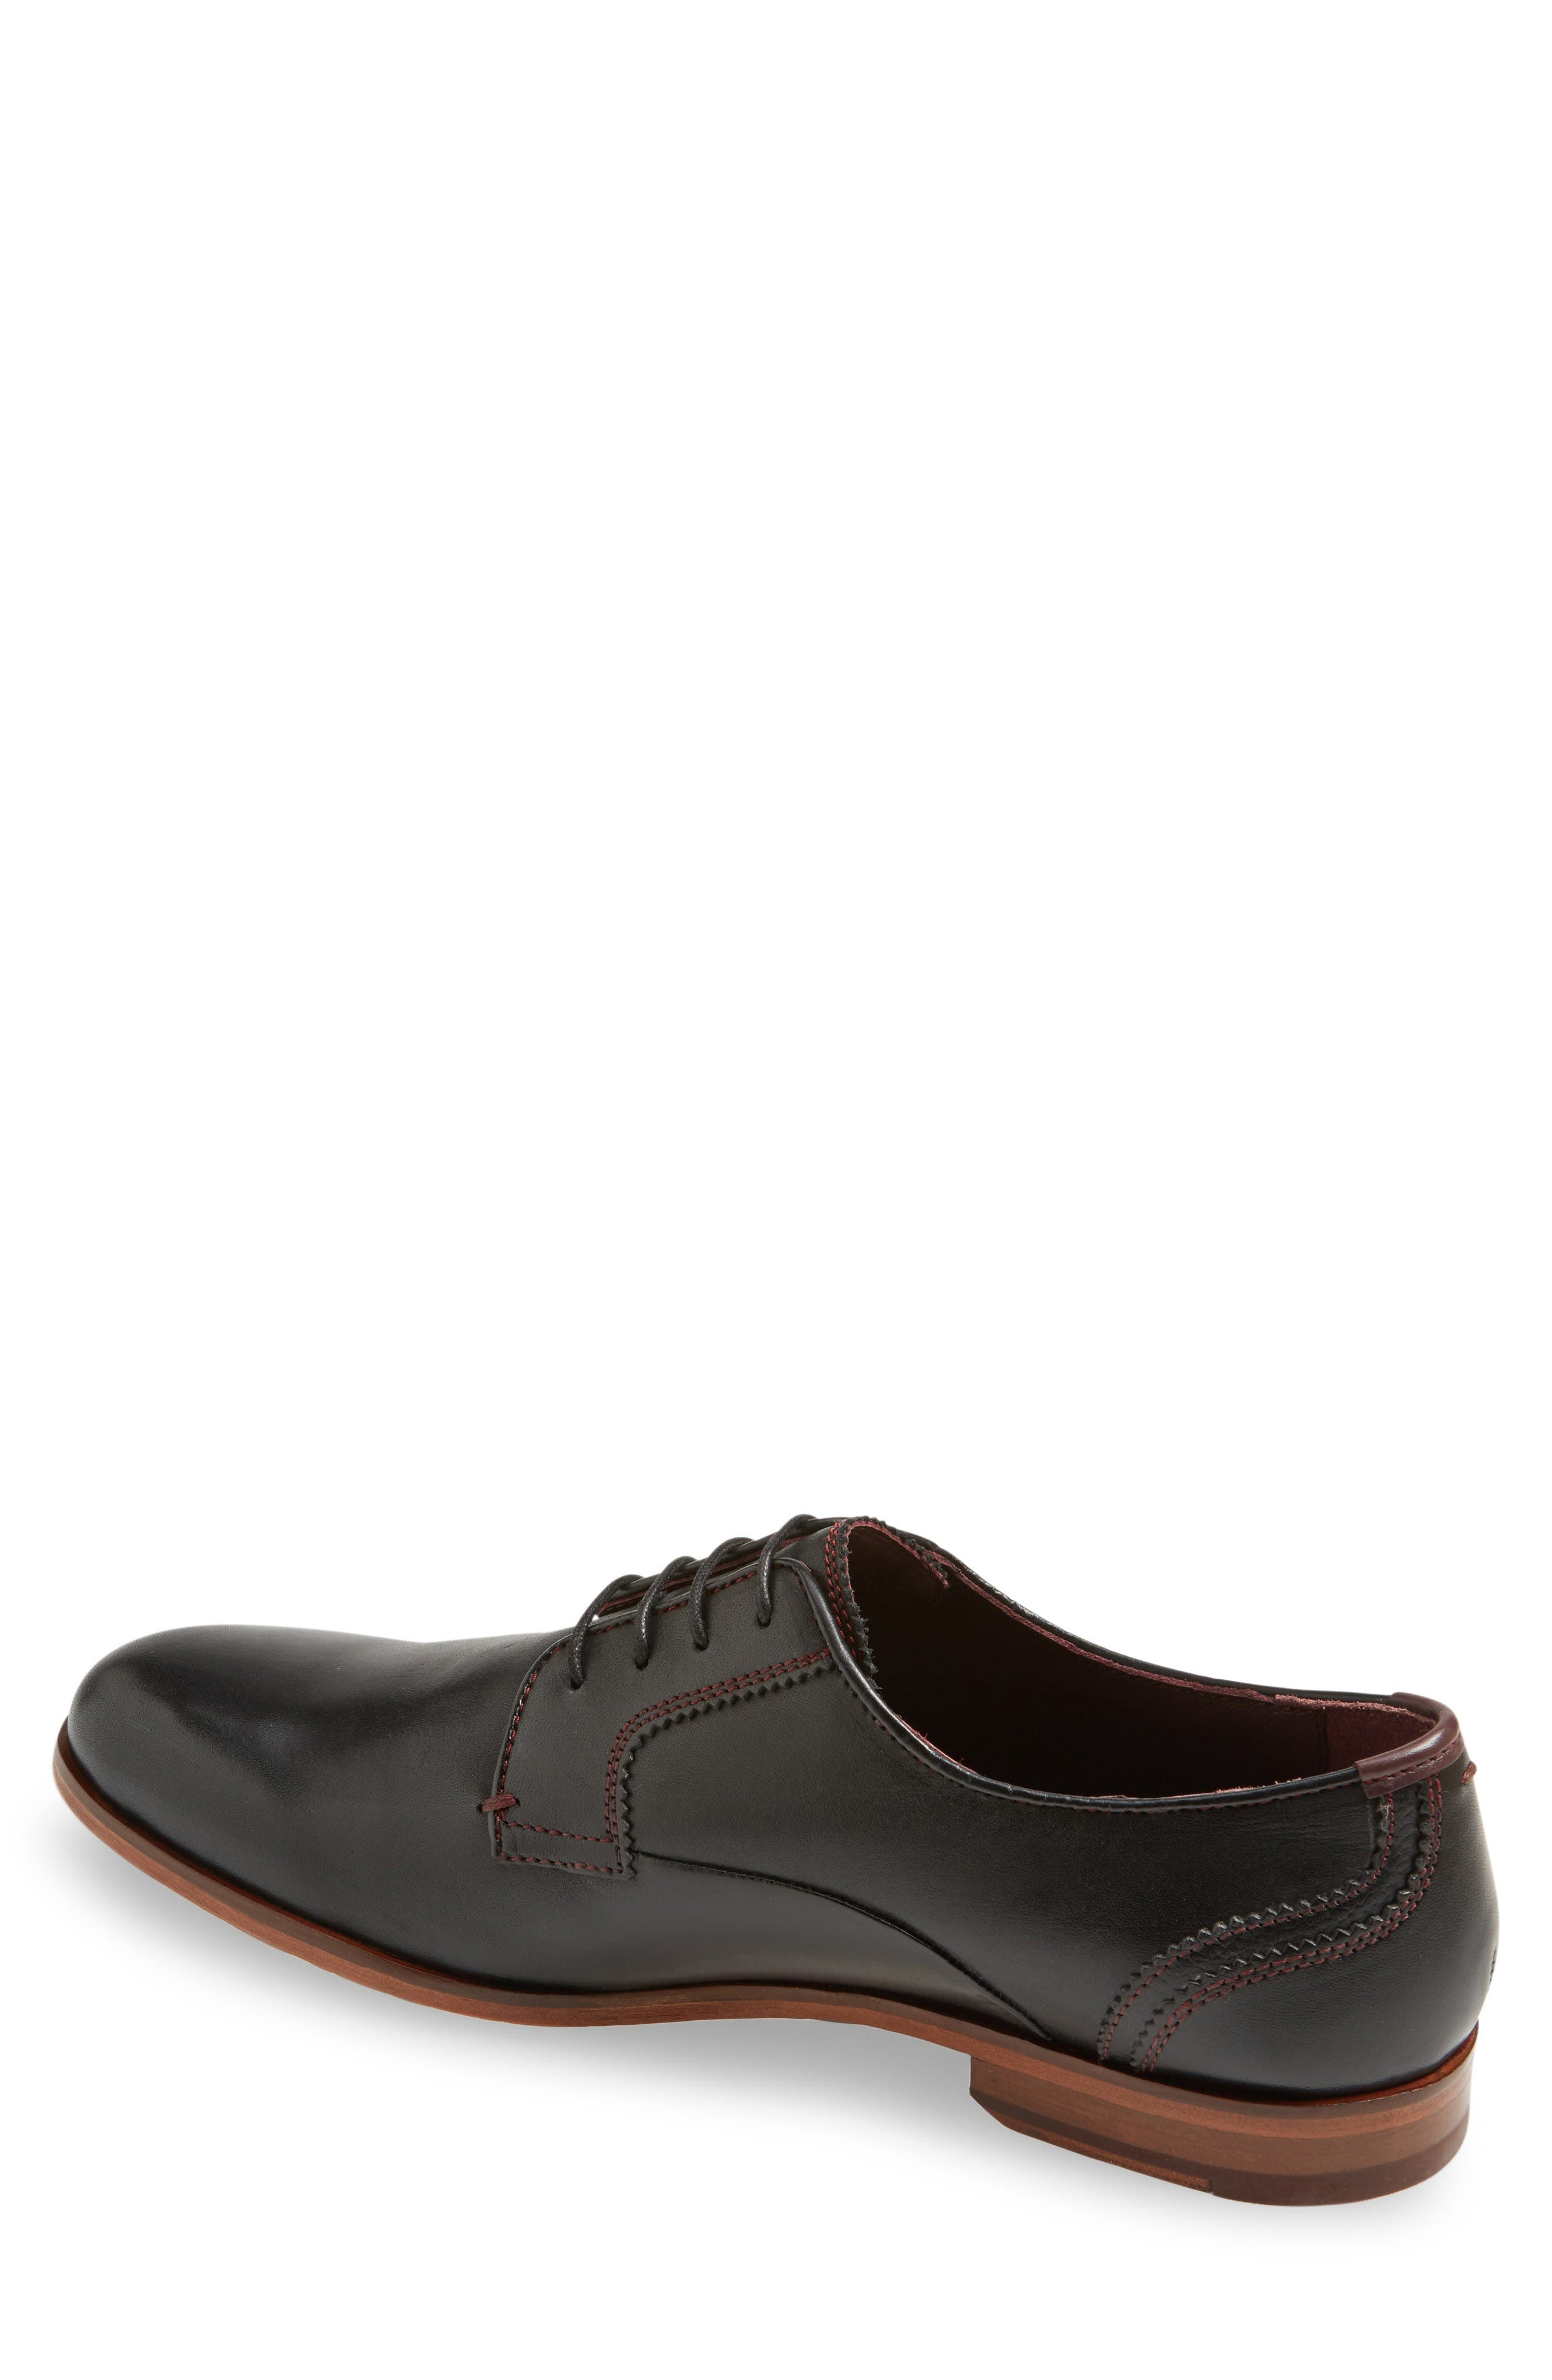 Iront Plain Toe Derby,                             Alternate thumbnail 2, color,                             Black Leather